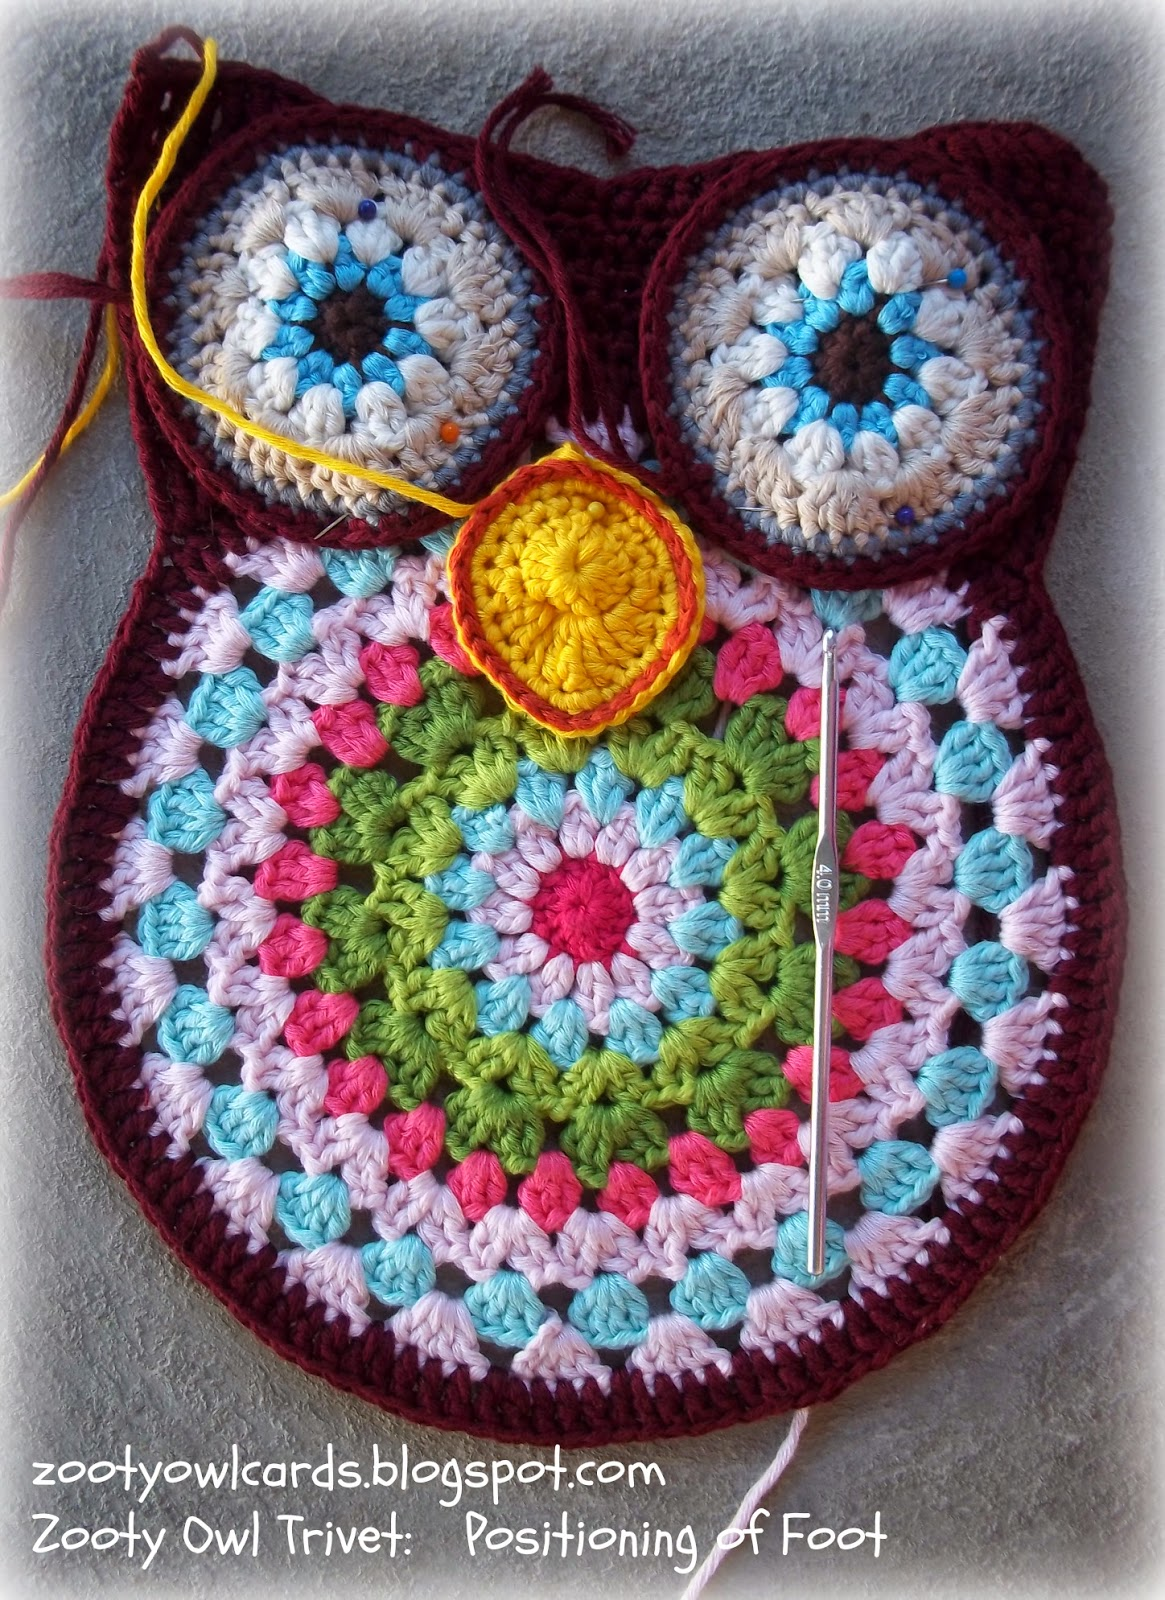 Zooty Owl S Crafty Blog Zooty Owl Trivets Pattern